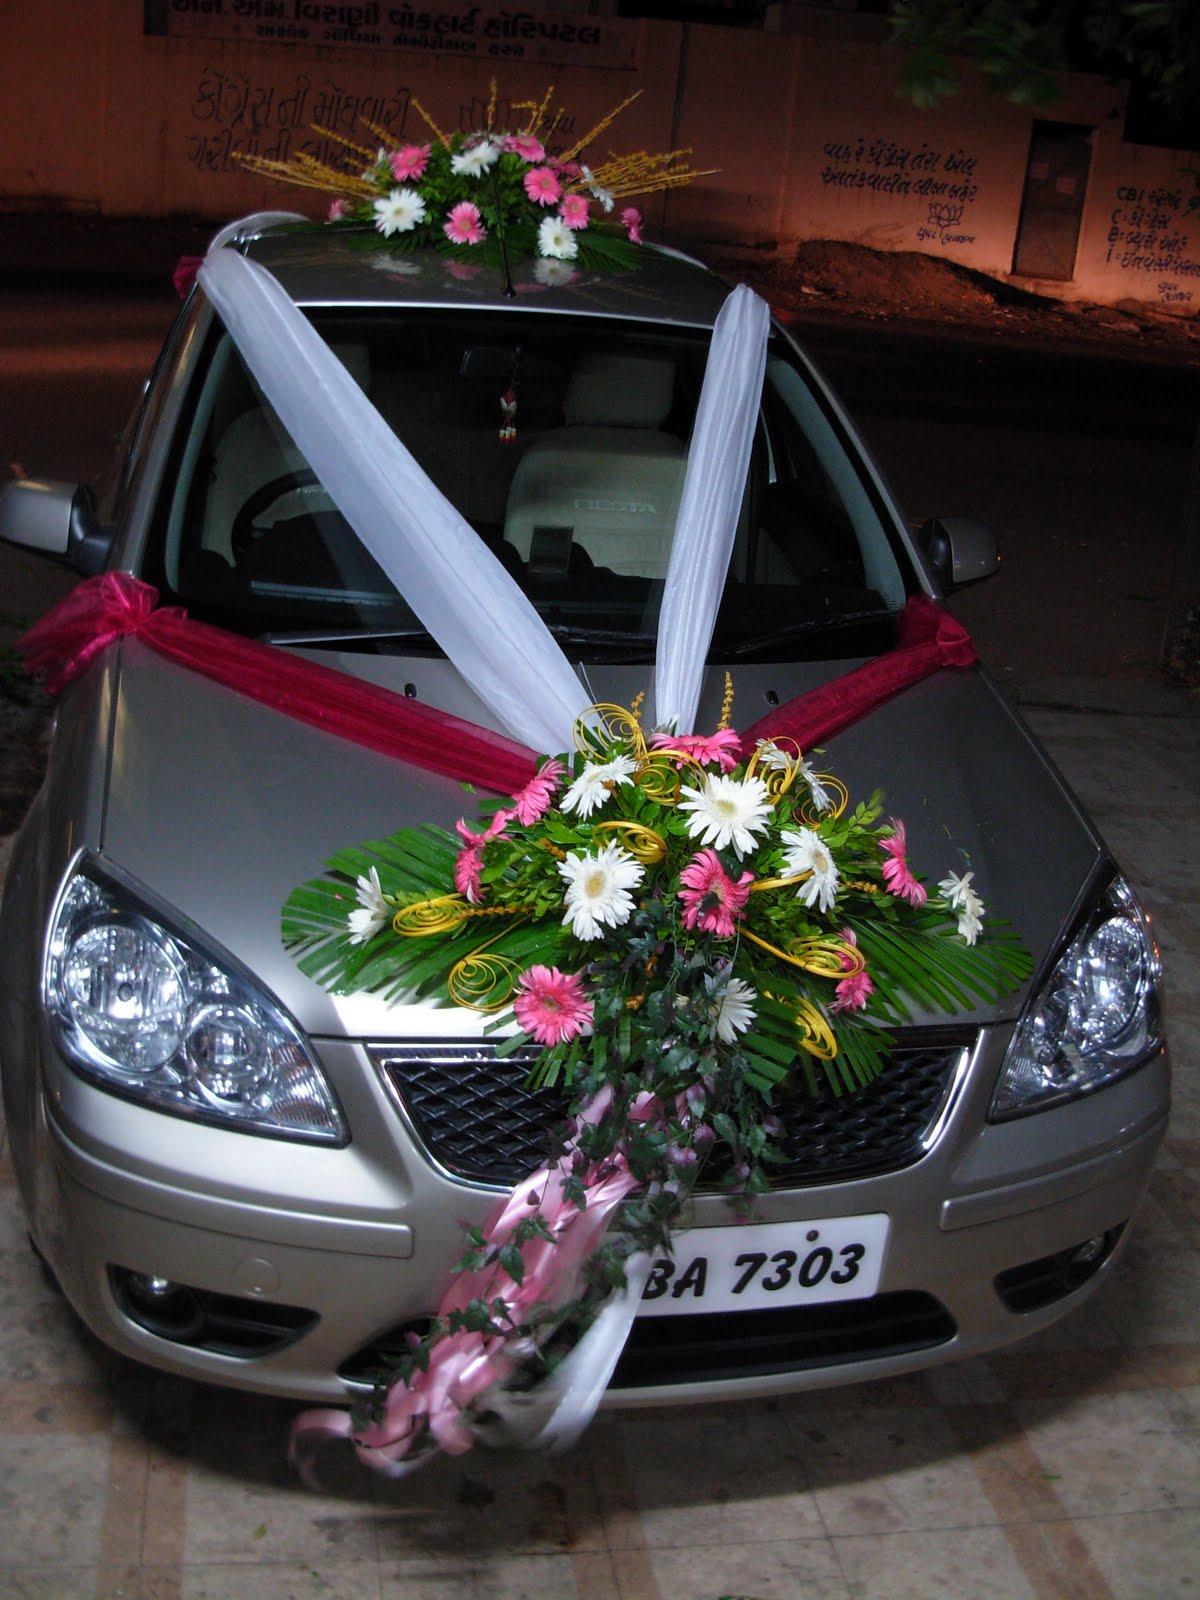 Flowers And Decoration: Wedding Car Decoration